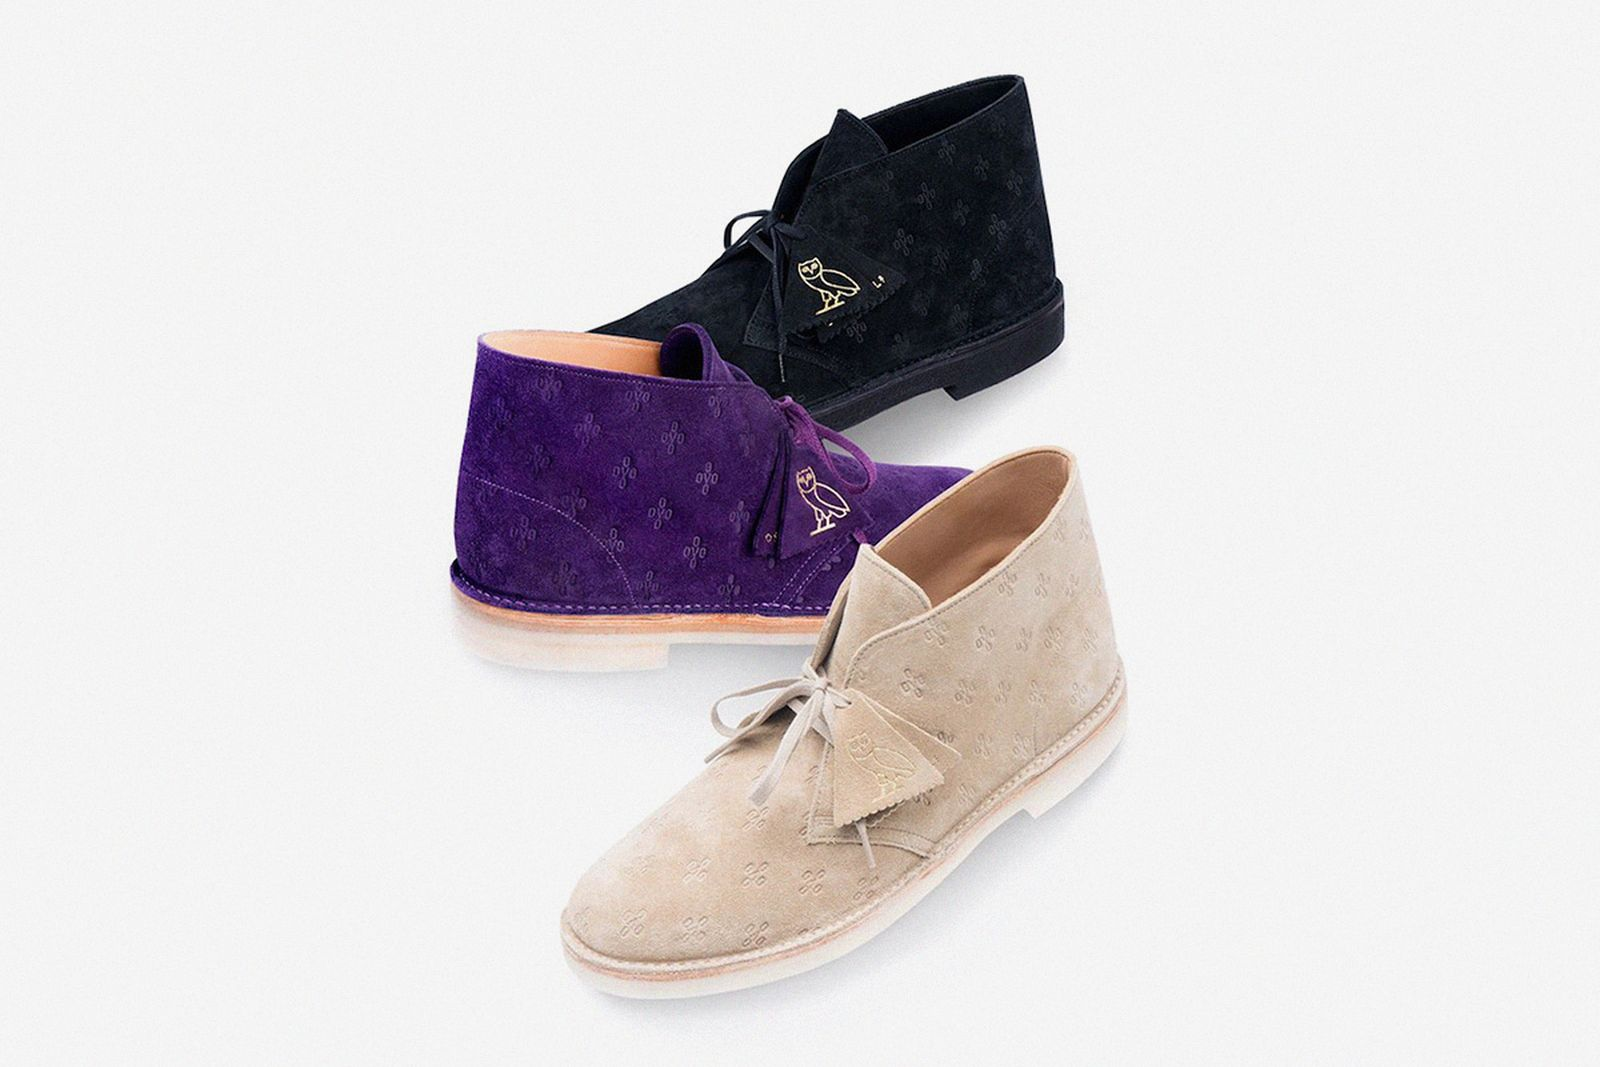 drake-ovo-footwear-collaboration-history-gallery-5